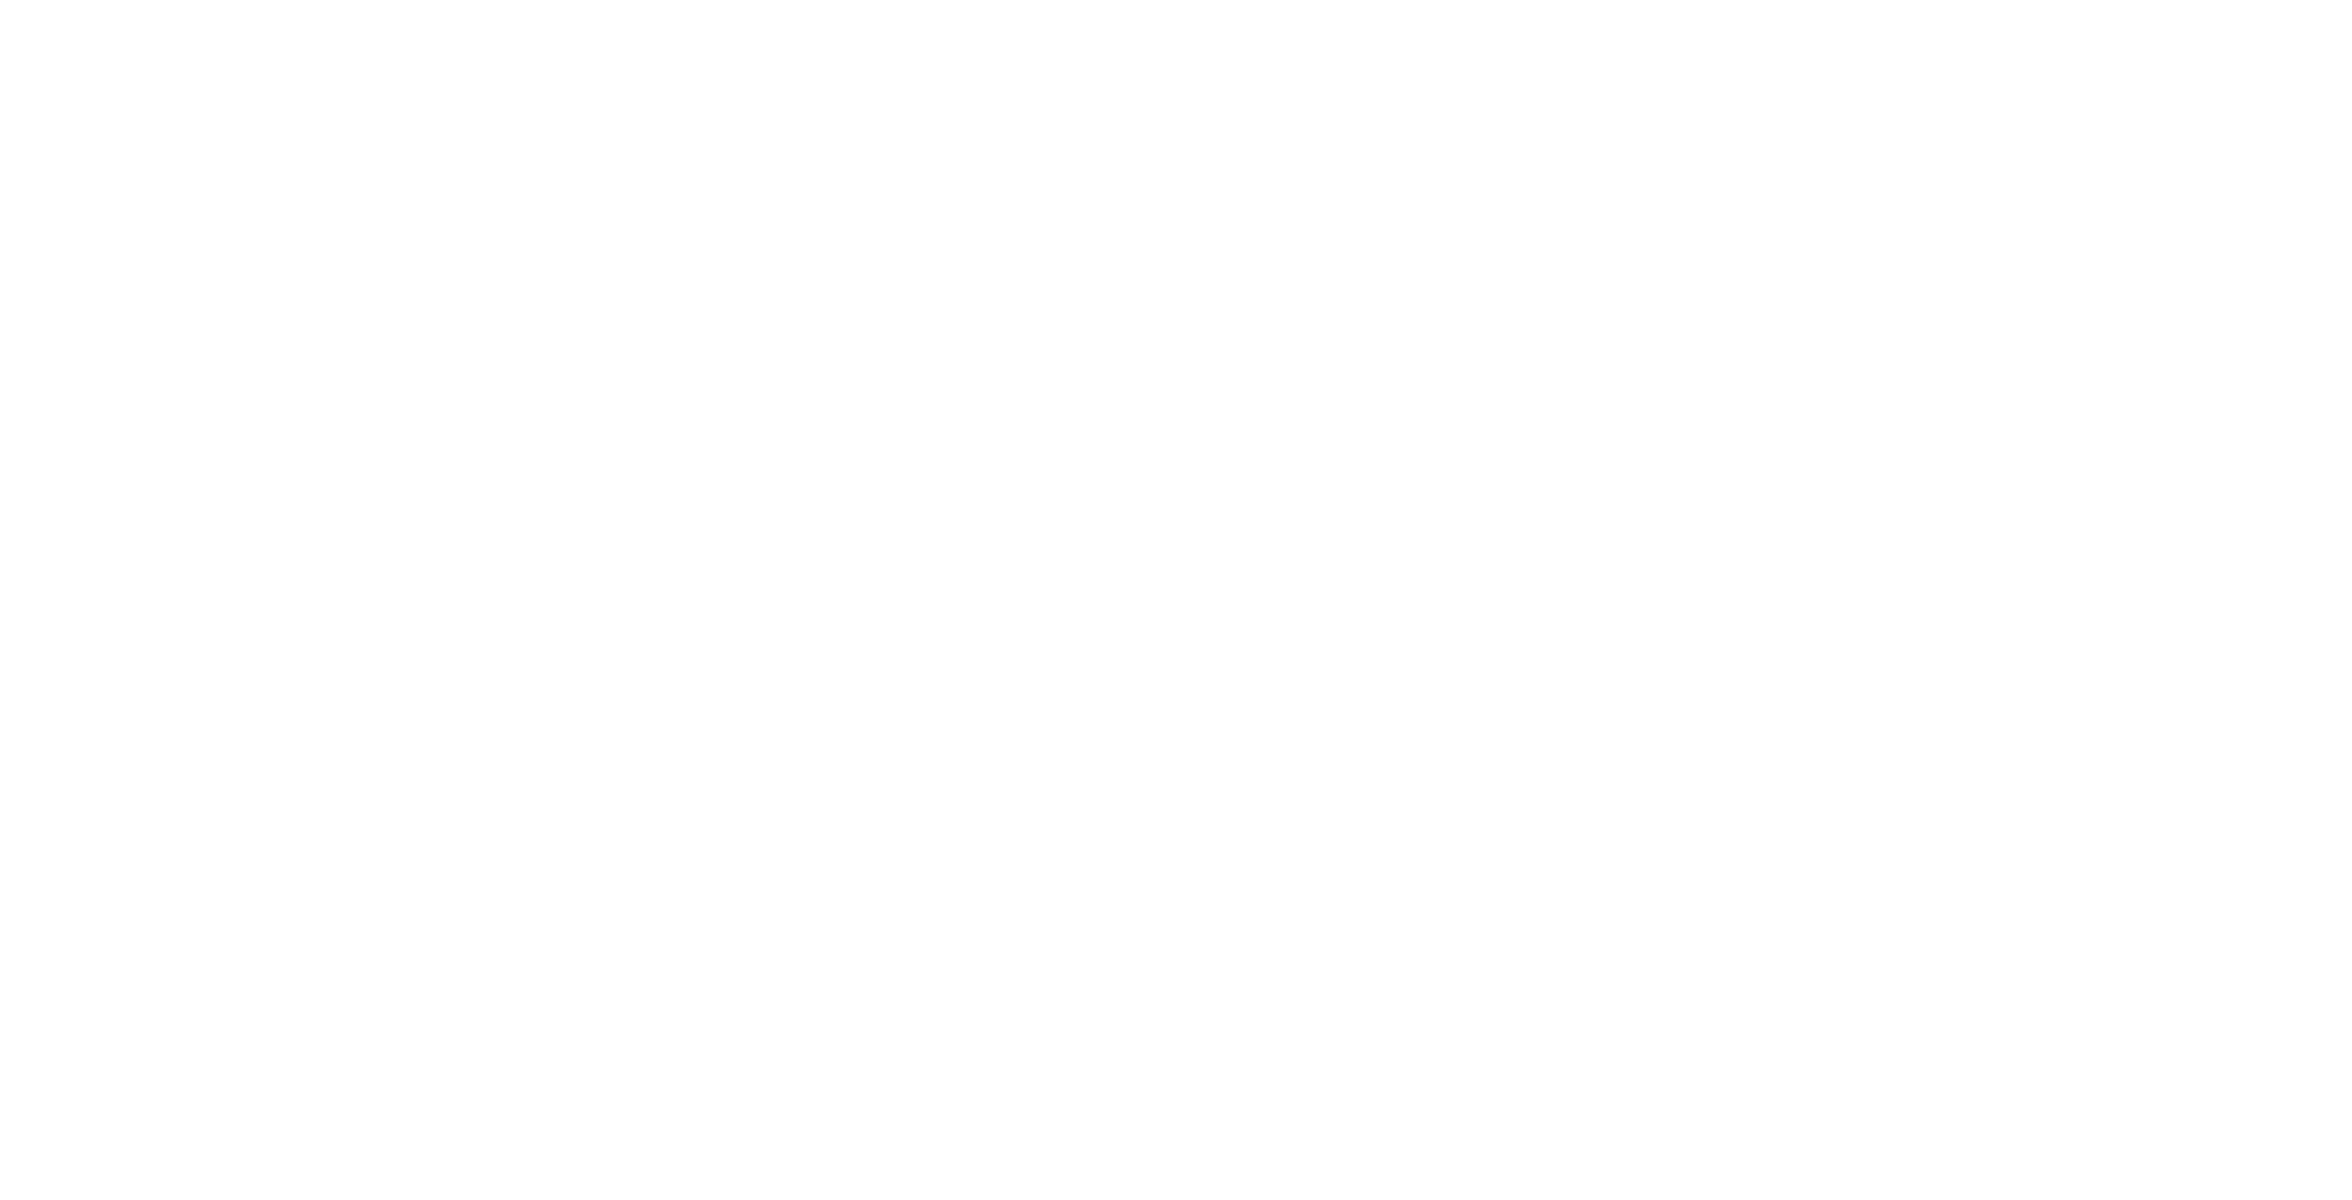 bolawrap_logo remote OR_white